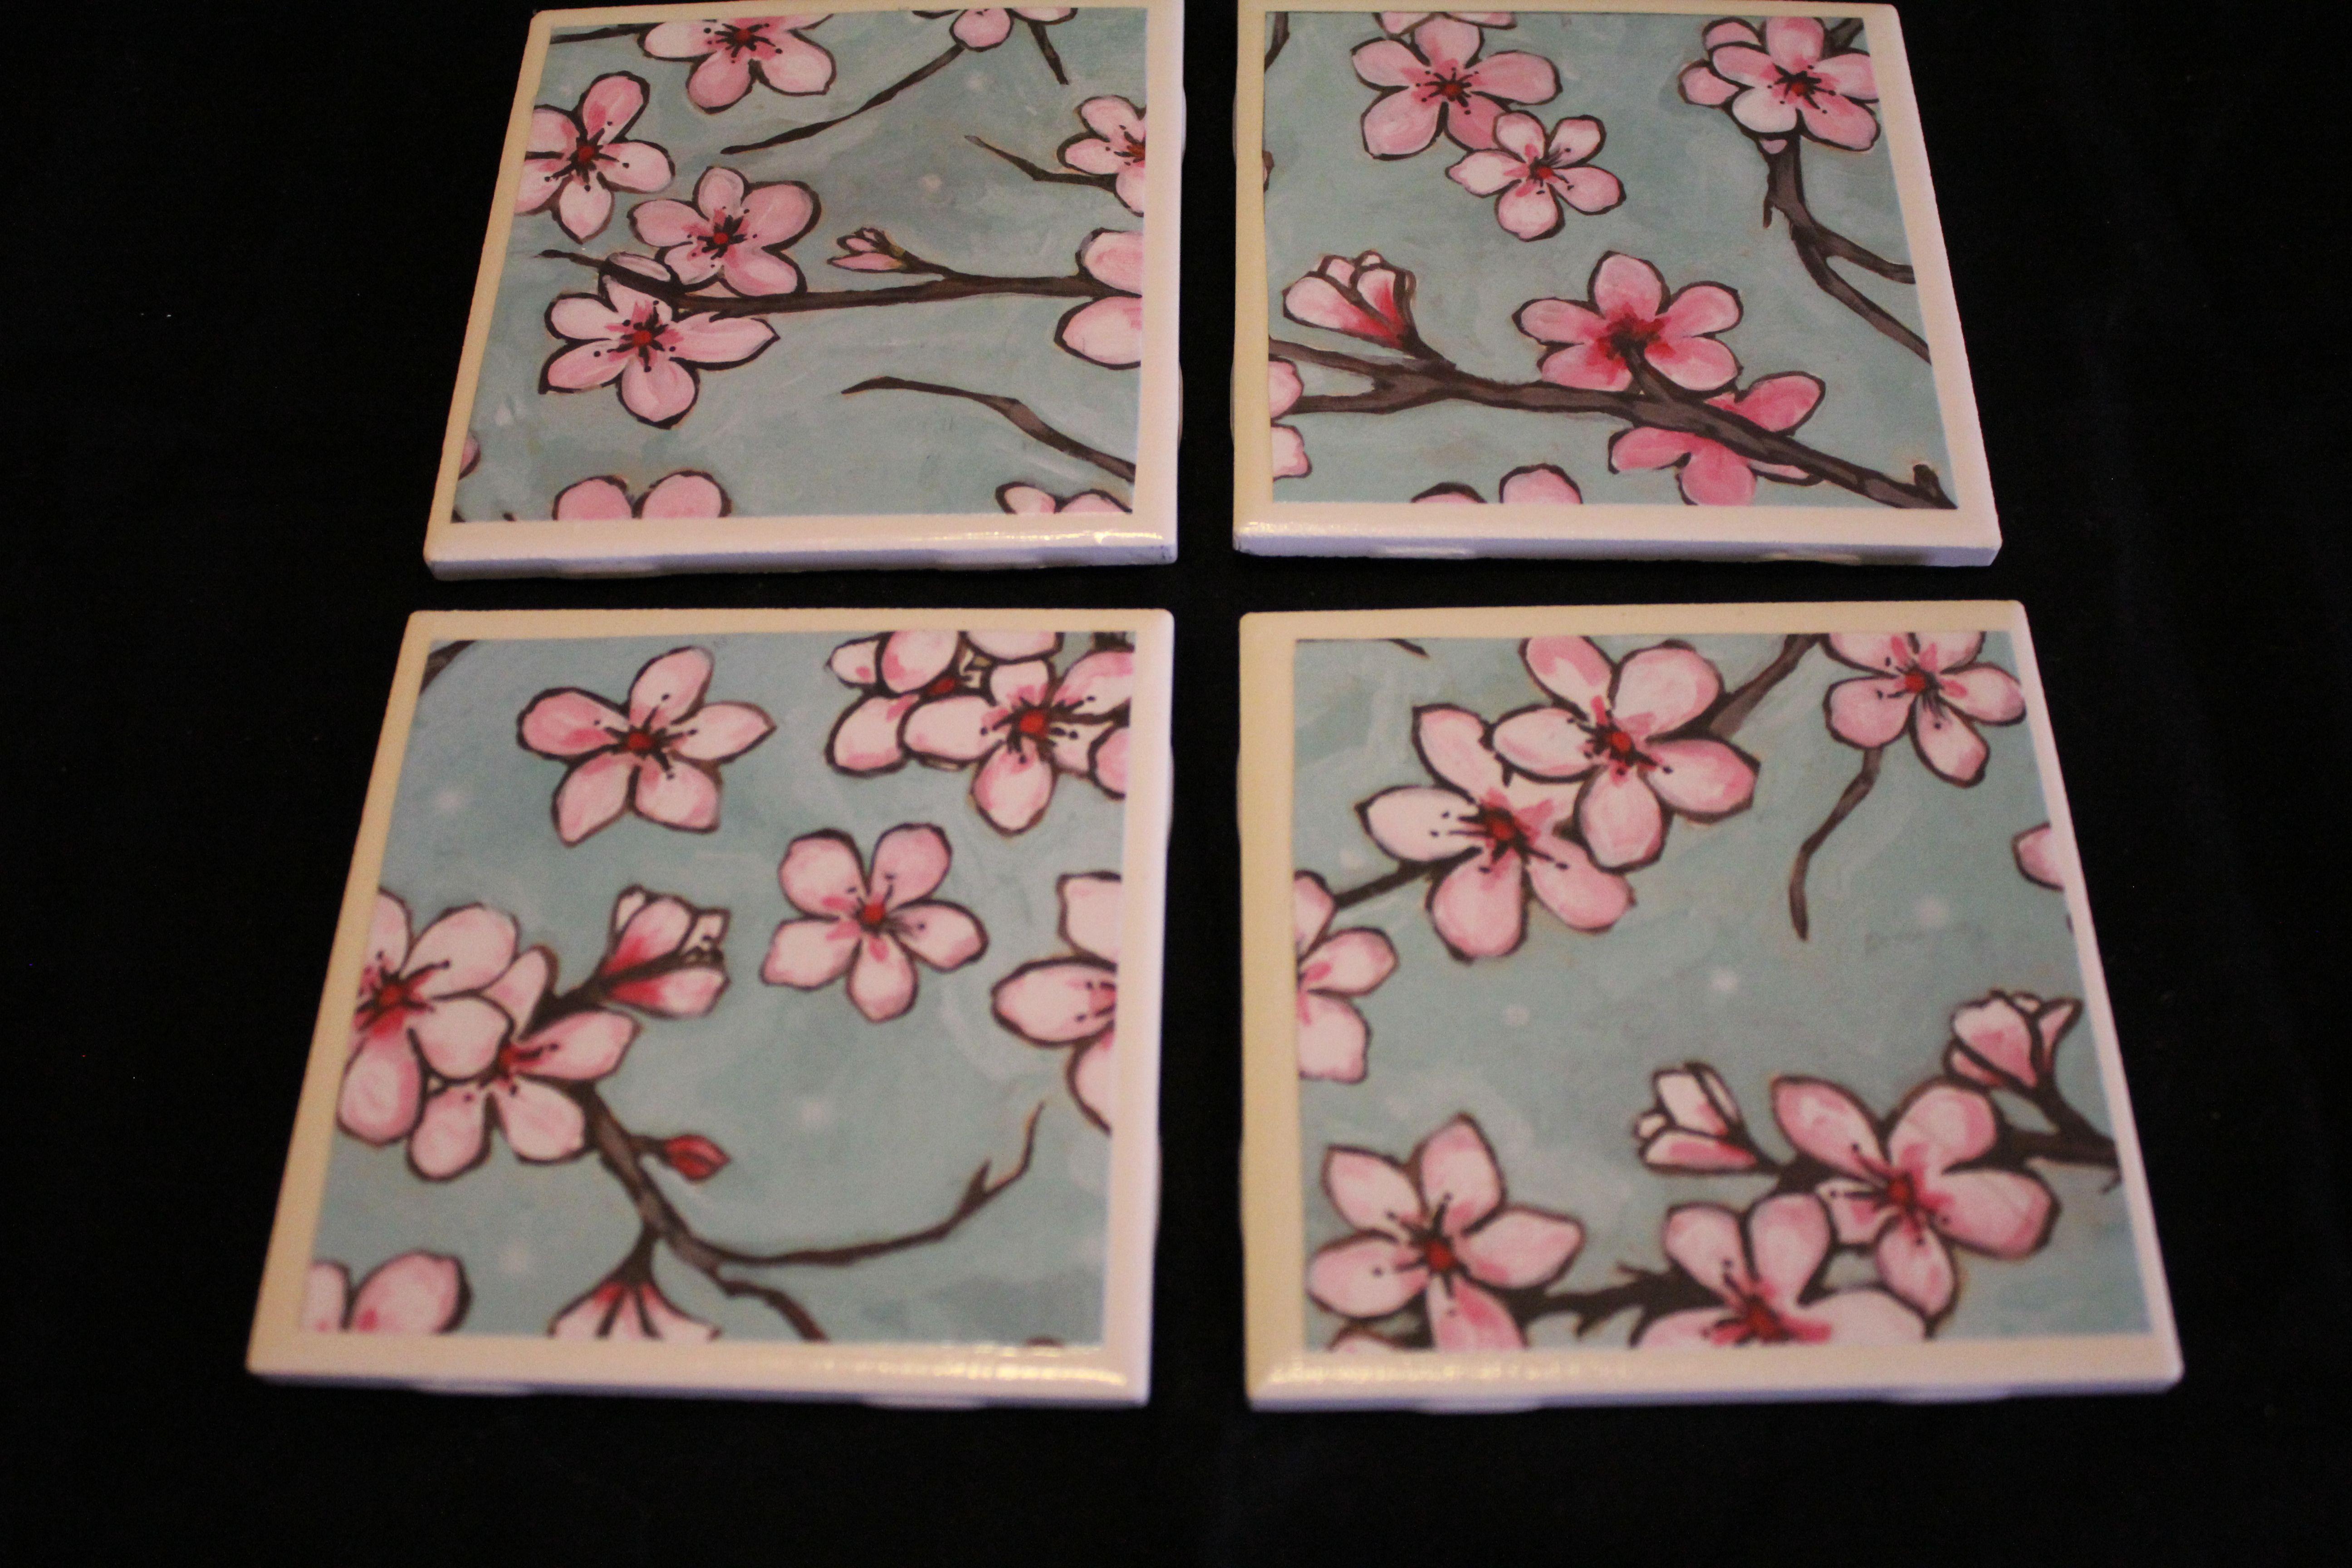 Ceramic tile coasters set of 4 6 craft ideas pinterest for Ceramic tile craft ideas